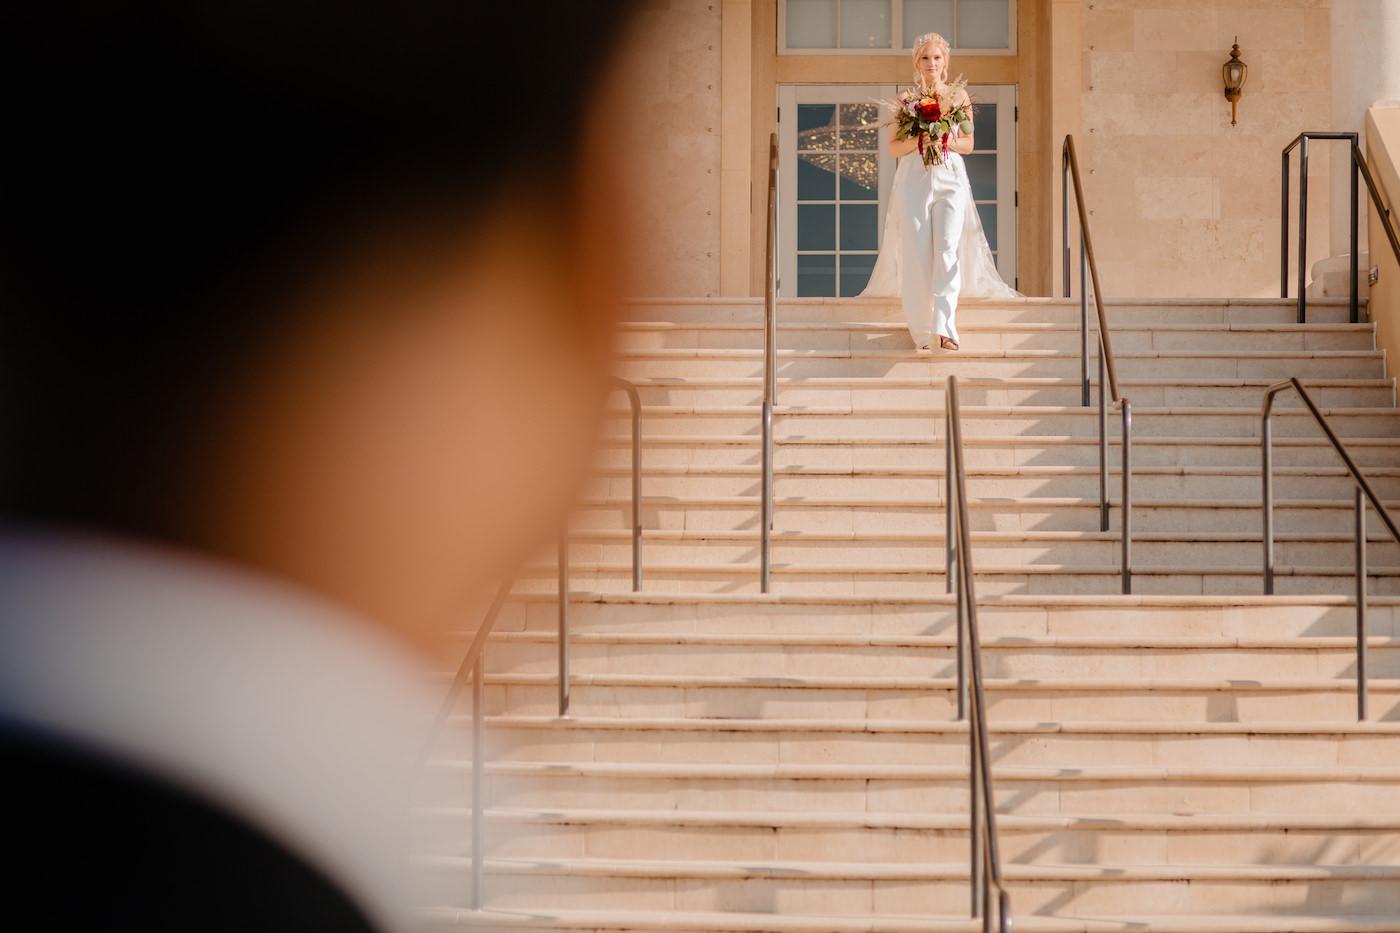 Boho Glam Wedding | Bride Walking Down the Aisle at Tampa Wedding Venue The Regent